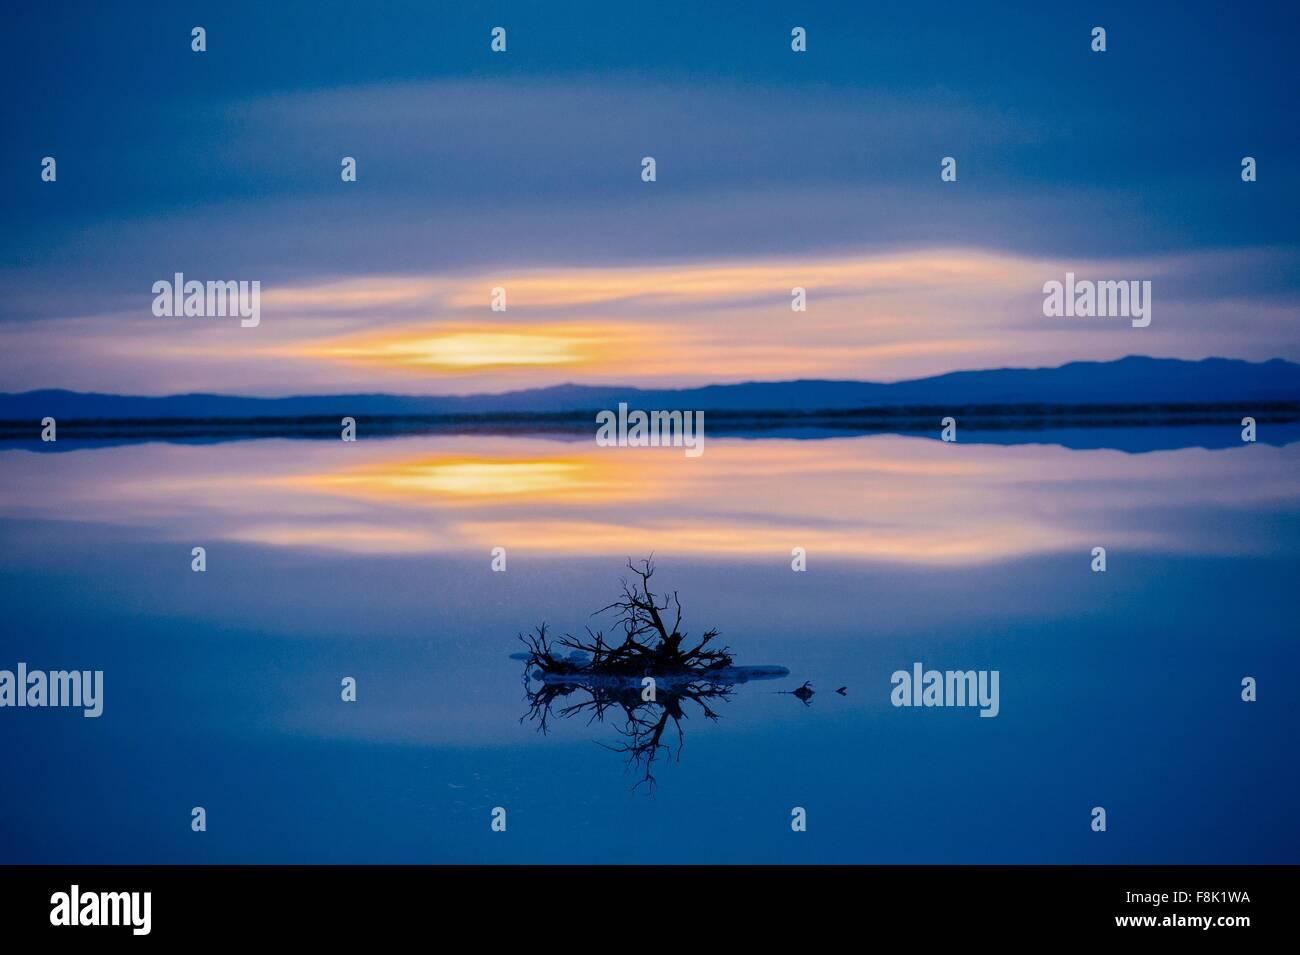 Reflection pool of horizon over water, blue evening sky and sunset, Bonneville, Utah, USA Stock Photo